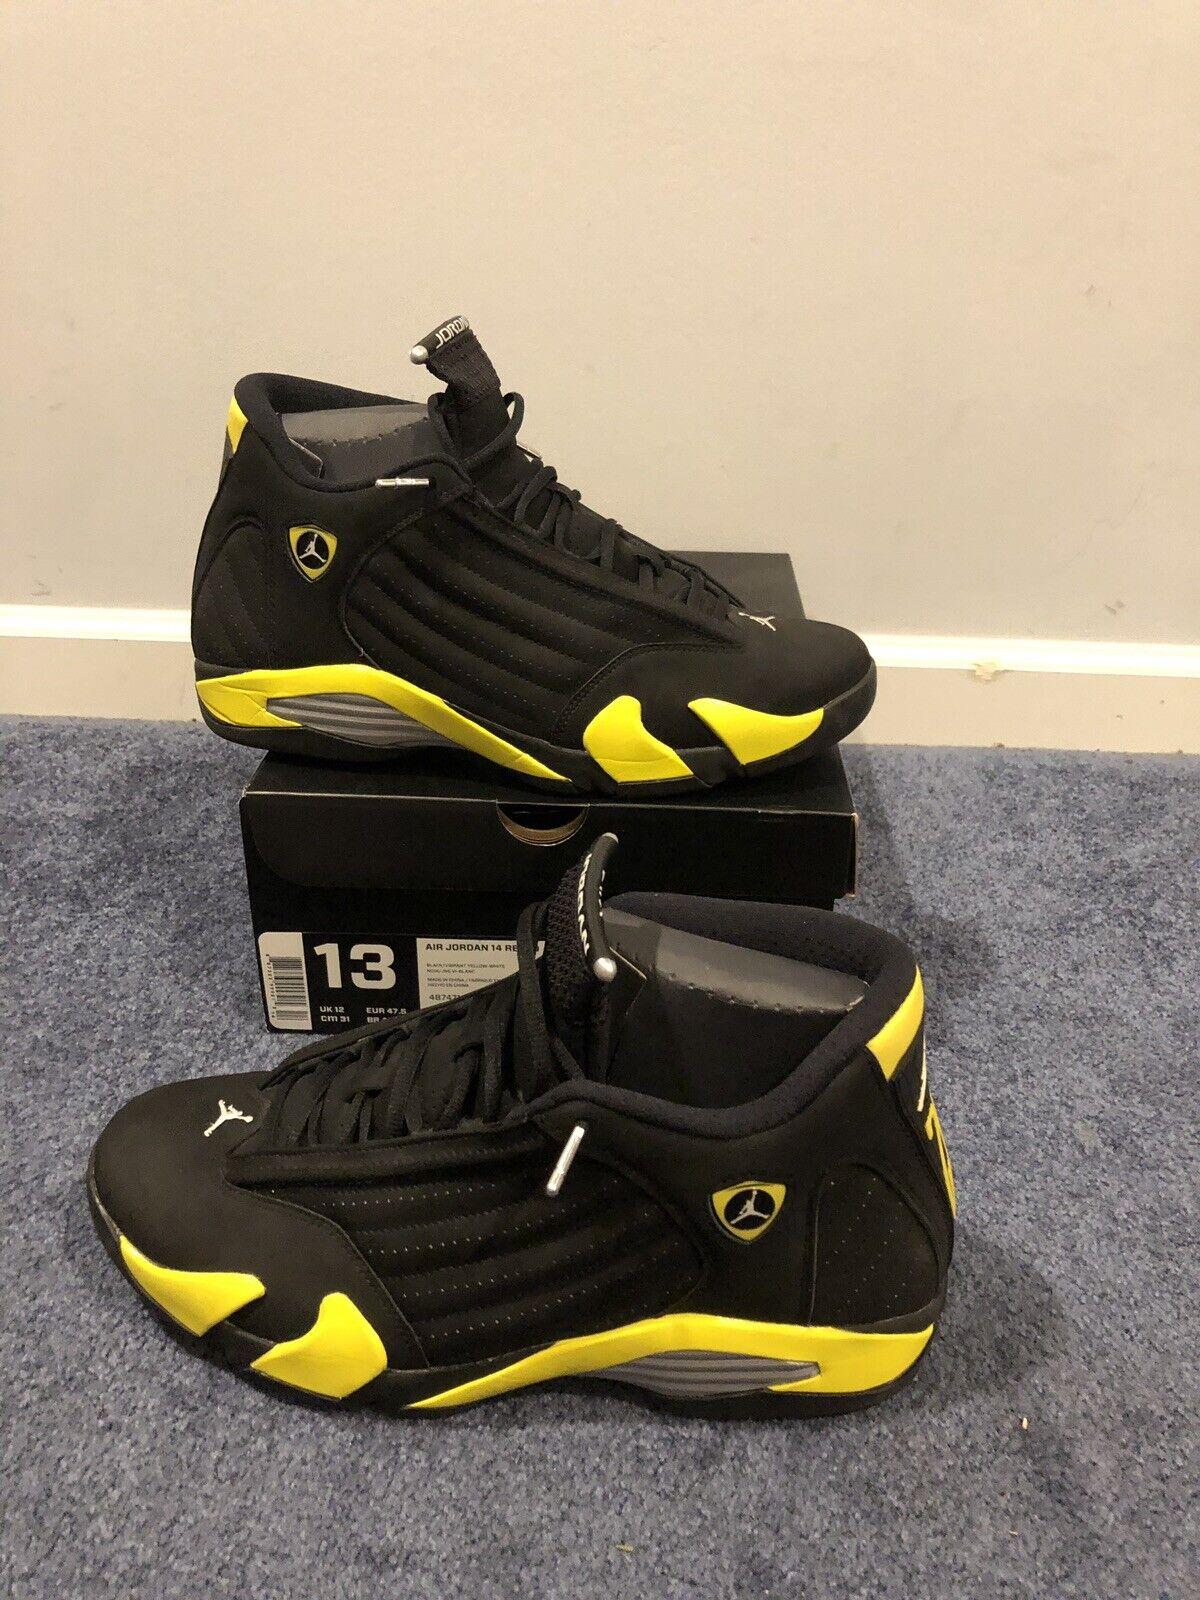 quality design aabae d08c3 Nike Air Jordan 14 Retro THUNDER Black Yellow White 487471-070 SIZE 13  W/RECEIPT